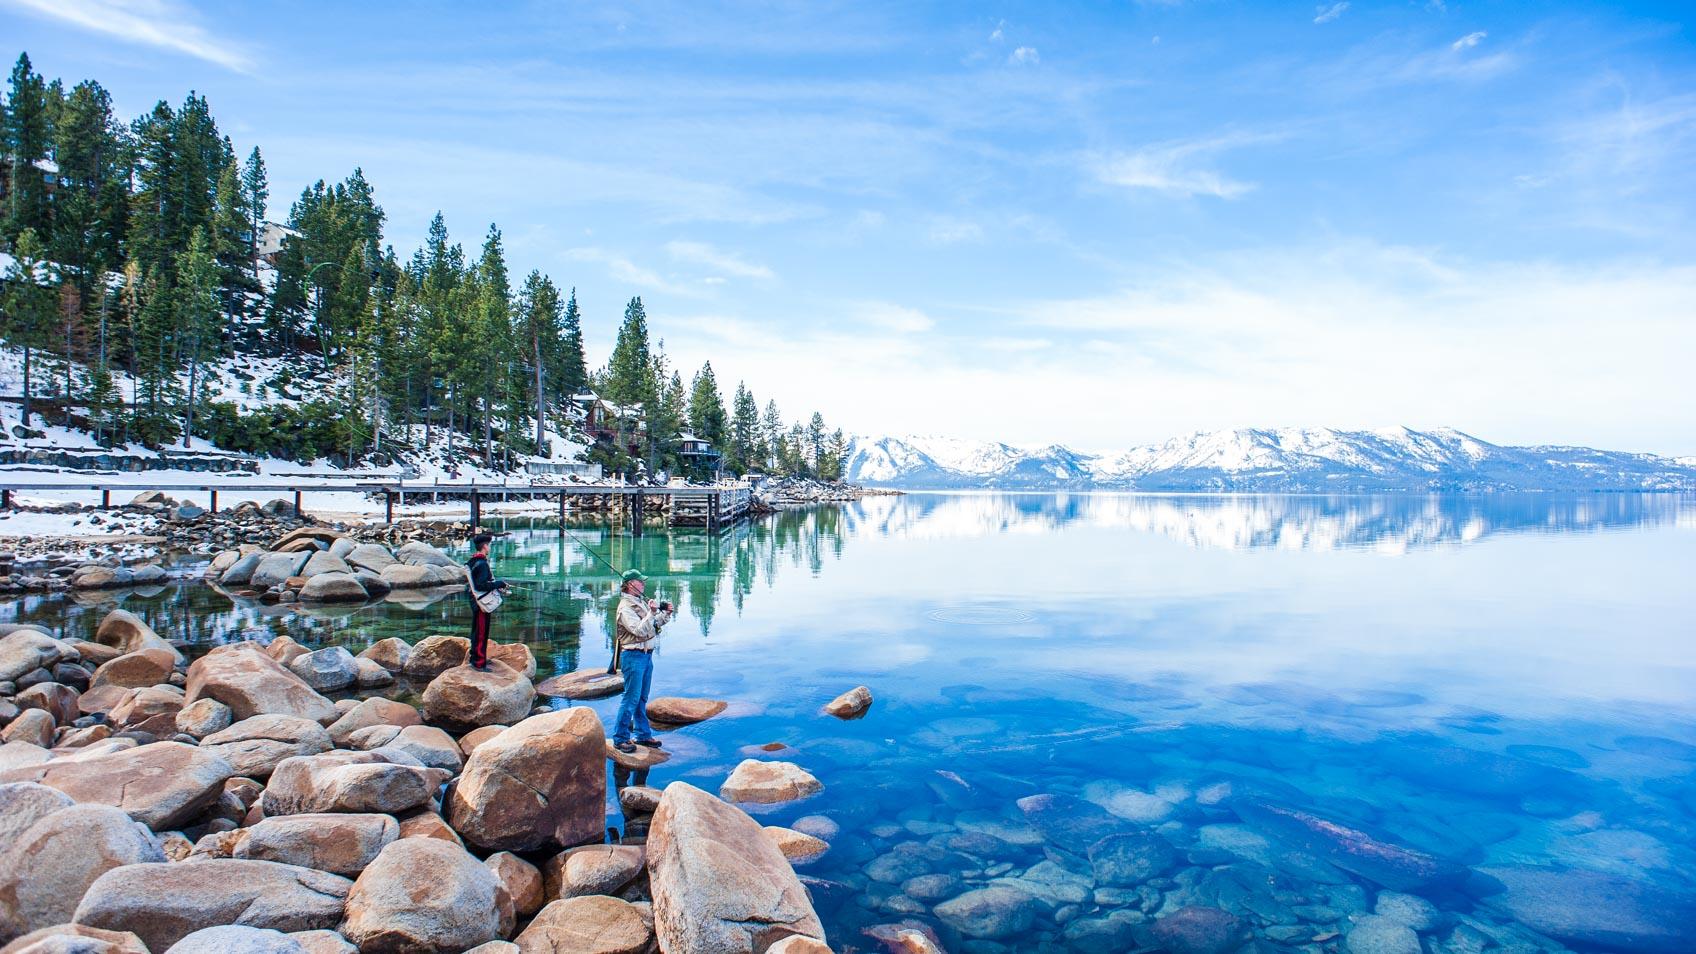 Holiday Travel Tips for Lake Tahoe  KuaPay